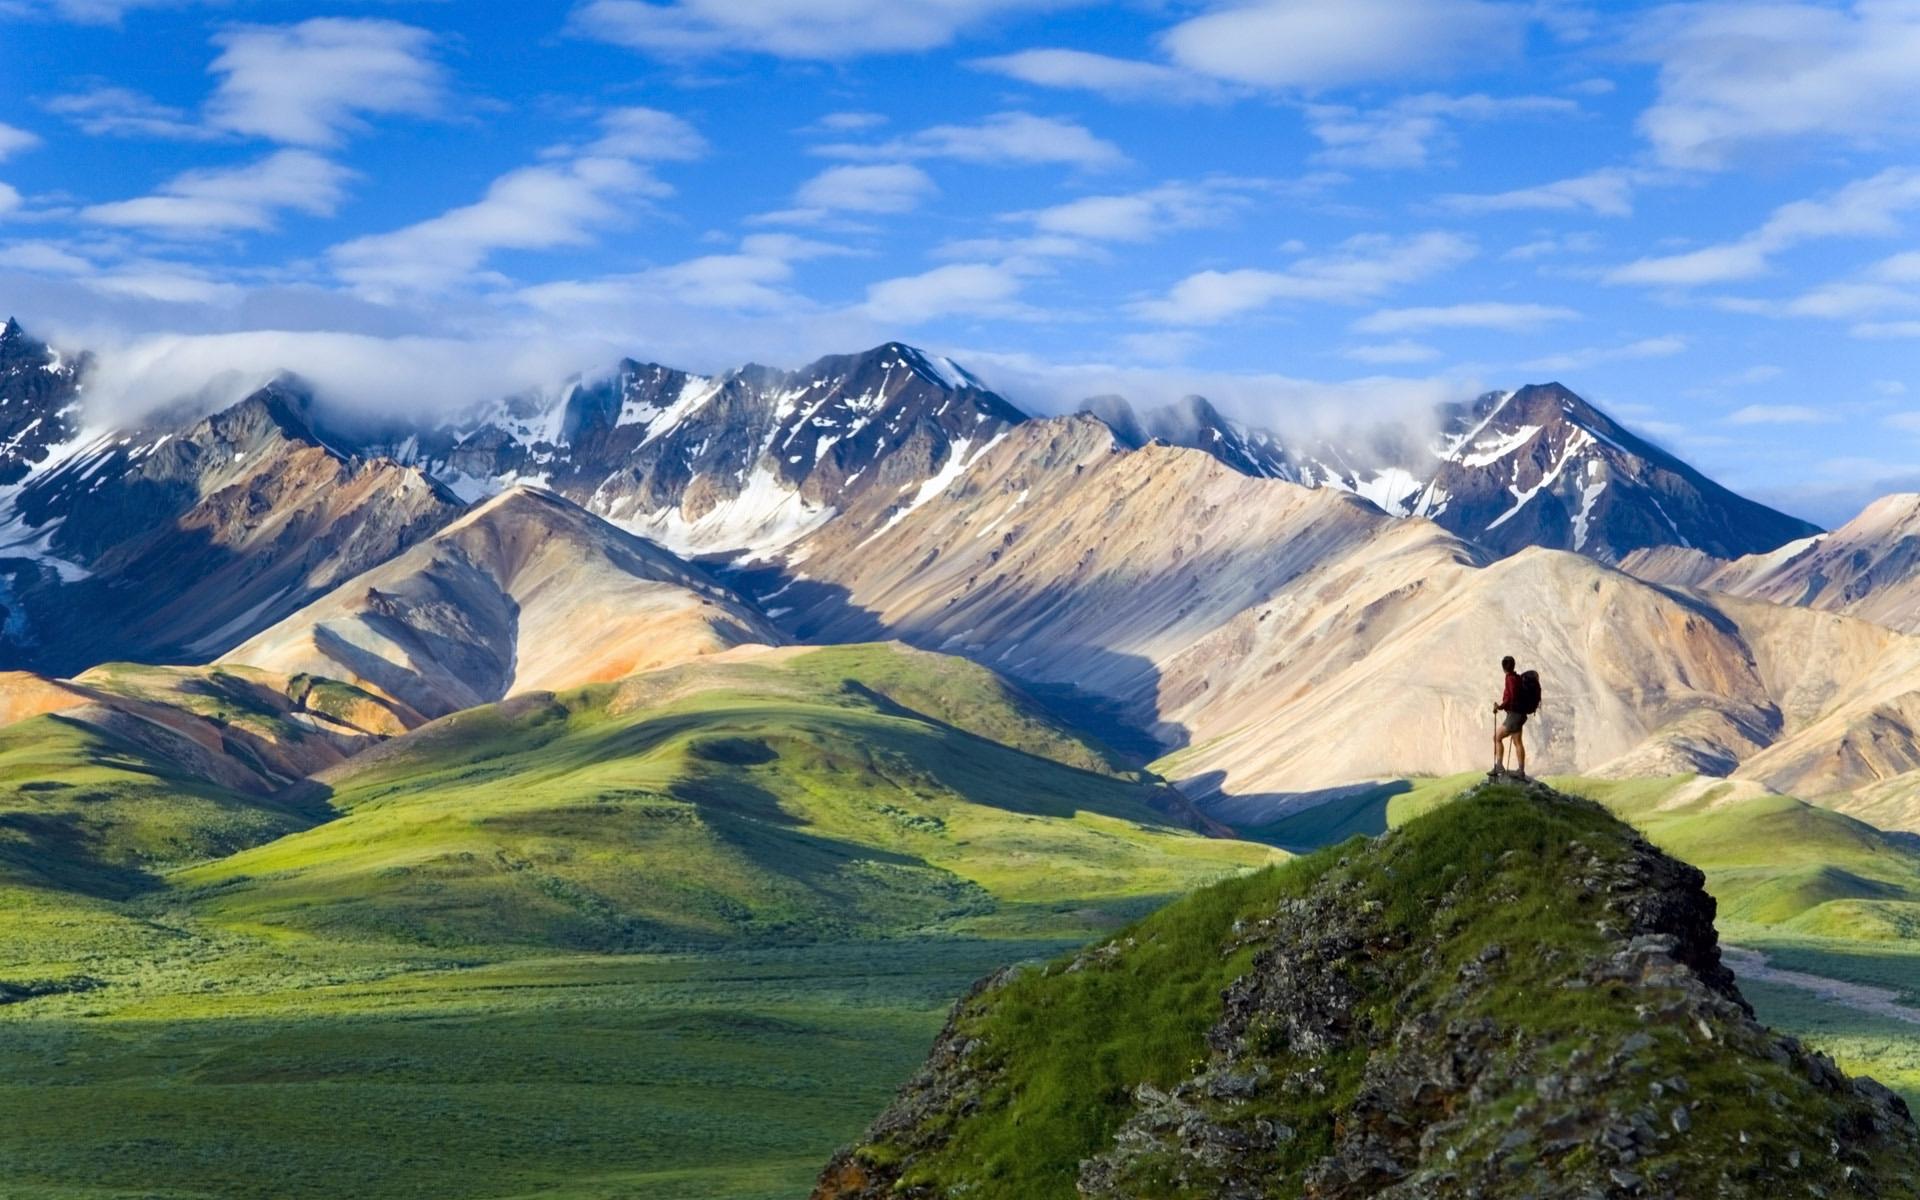 Polychrome Pass overlooking the Alaska Range Denali National Park, Alaska (© Alaska Stock/age fotostock)